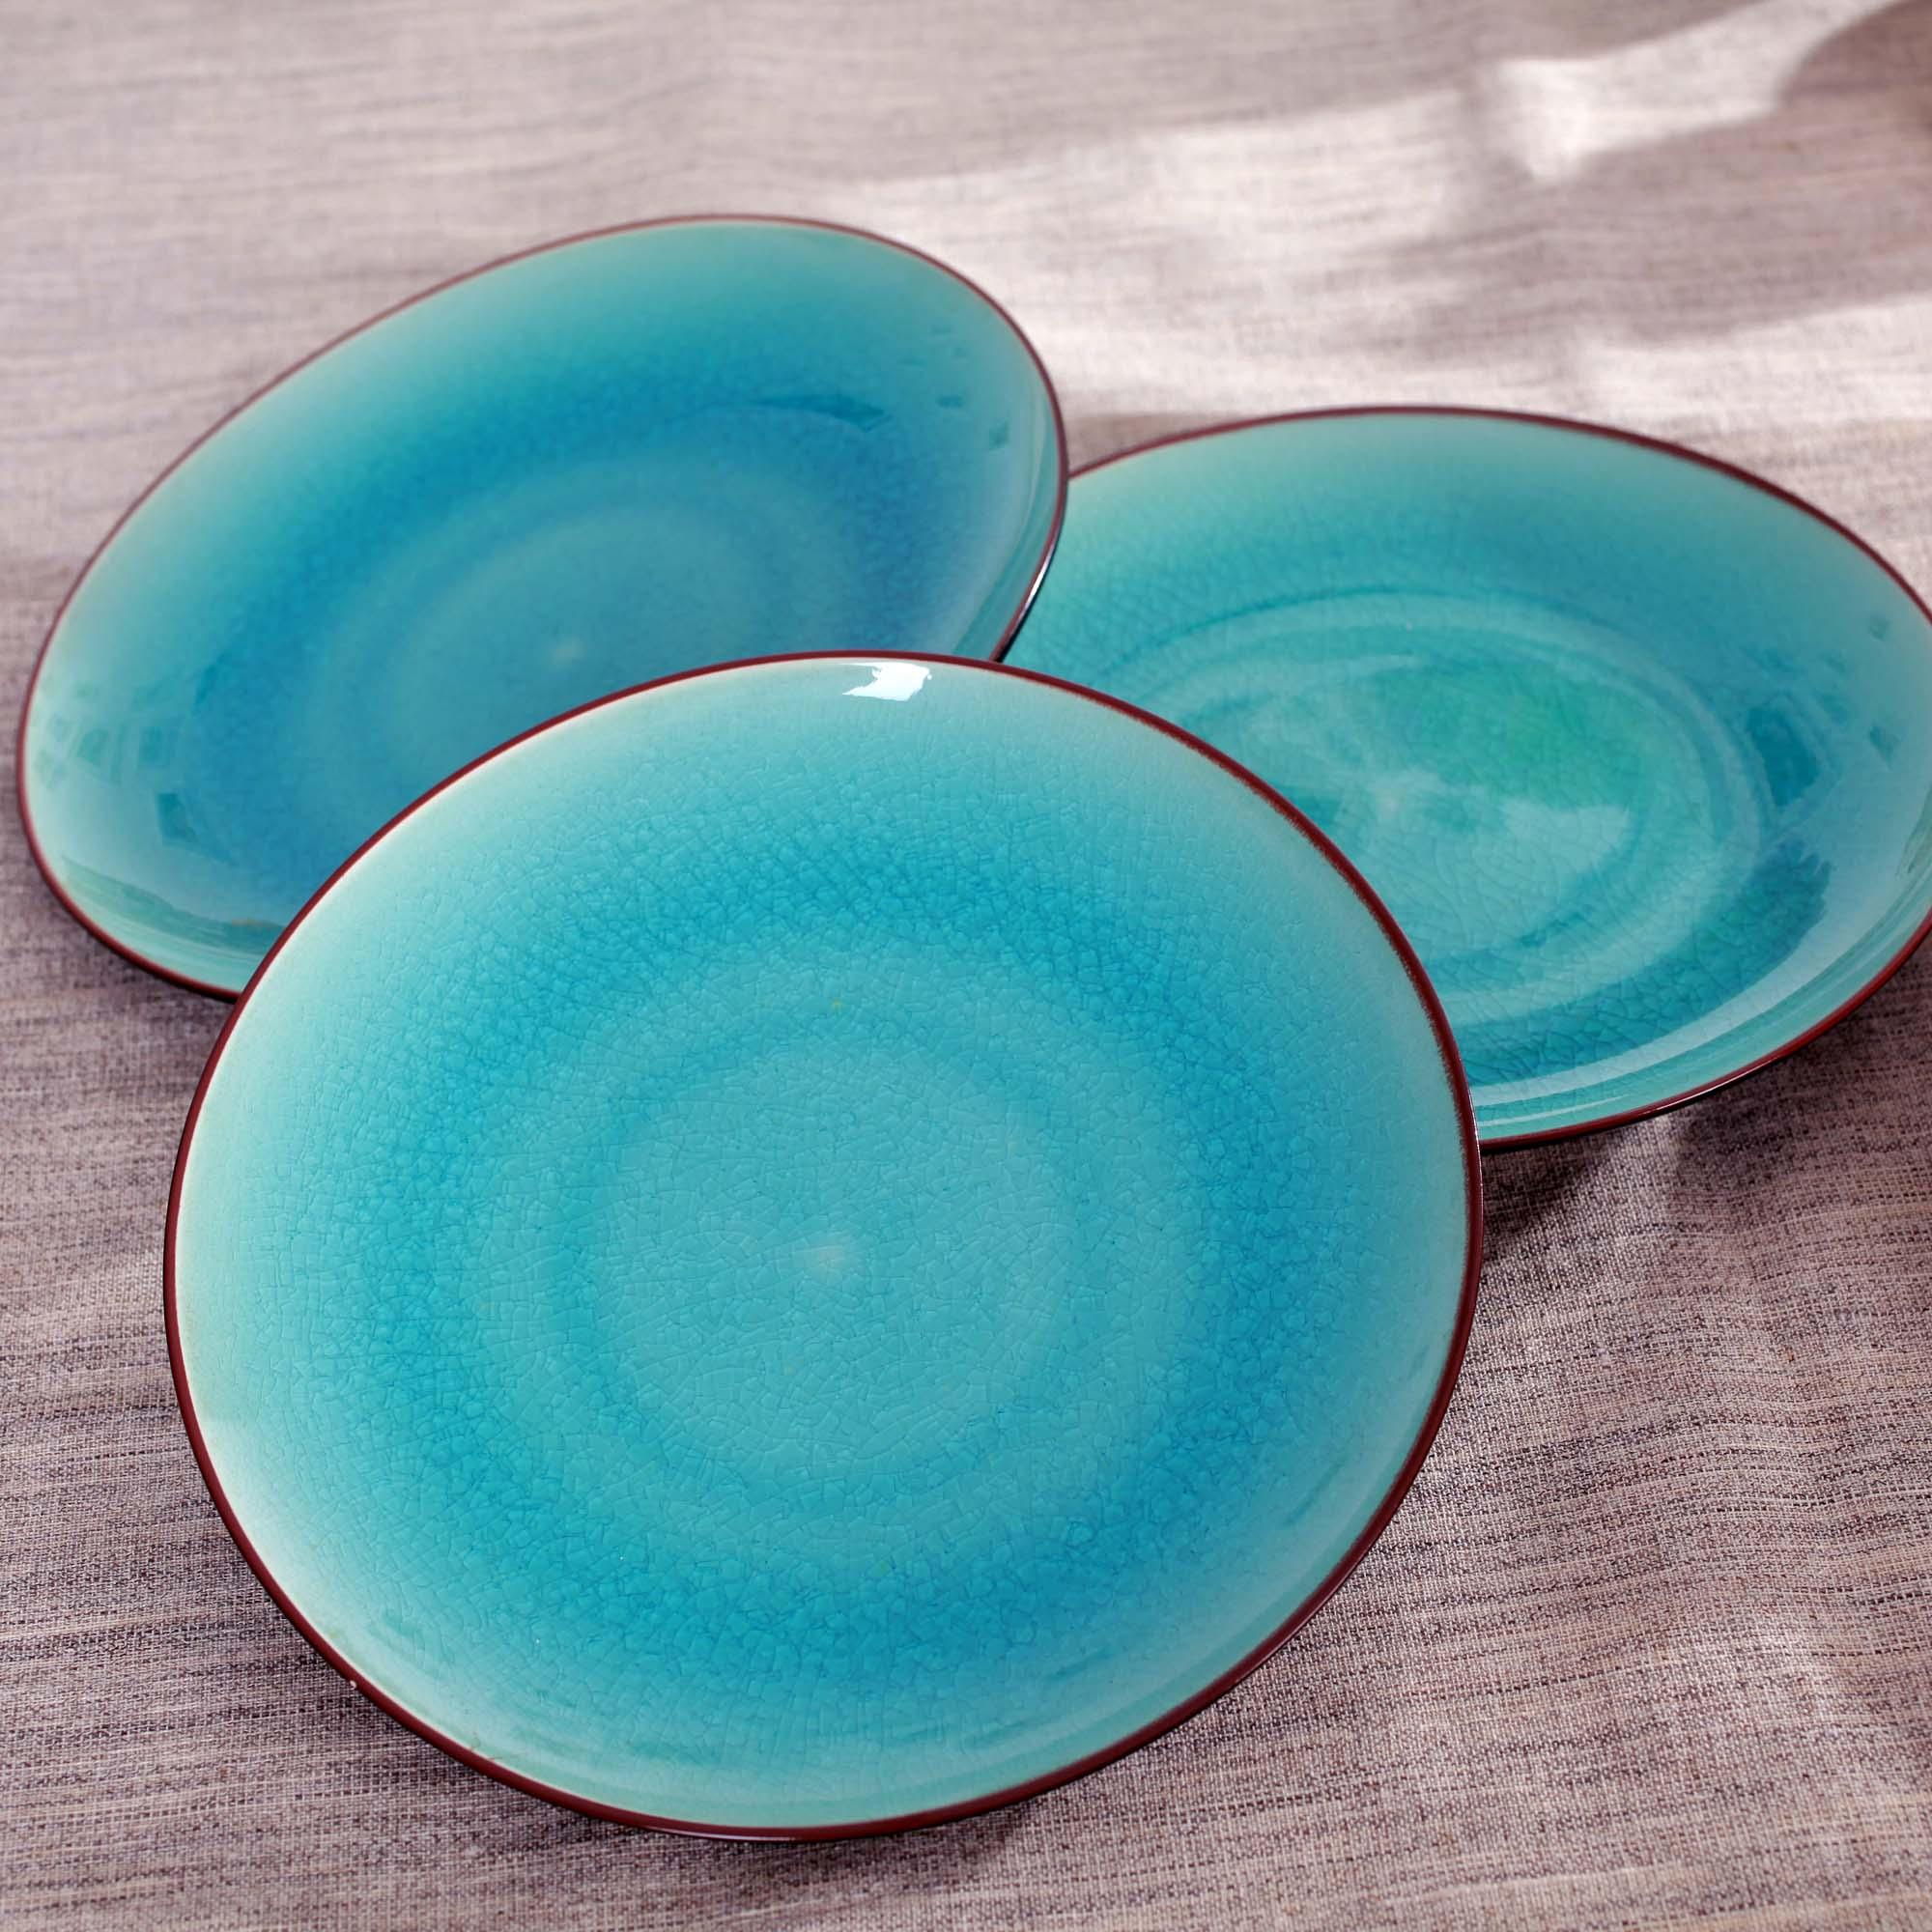 Jingdezhen ceramic crystal glaze dinnerware set 8.5 flat western dishes gift box set piece set-in Porcelain Plates from Home u0026 Garden on Aliexpress.com ... & Jingdezhen ceramic crystal glaze dinnerware set 8.5 flat western ...